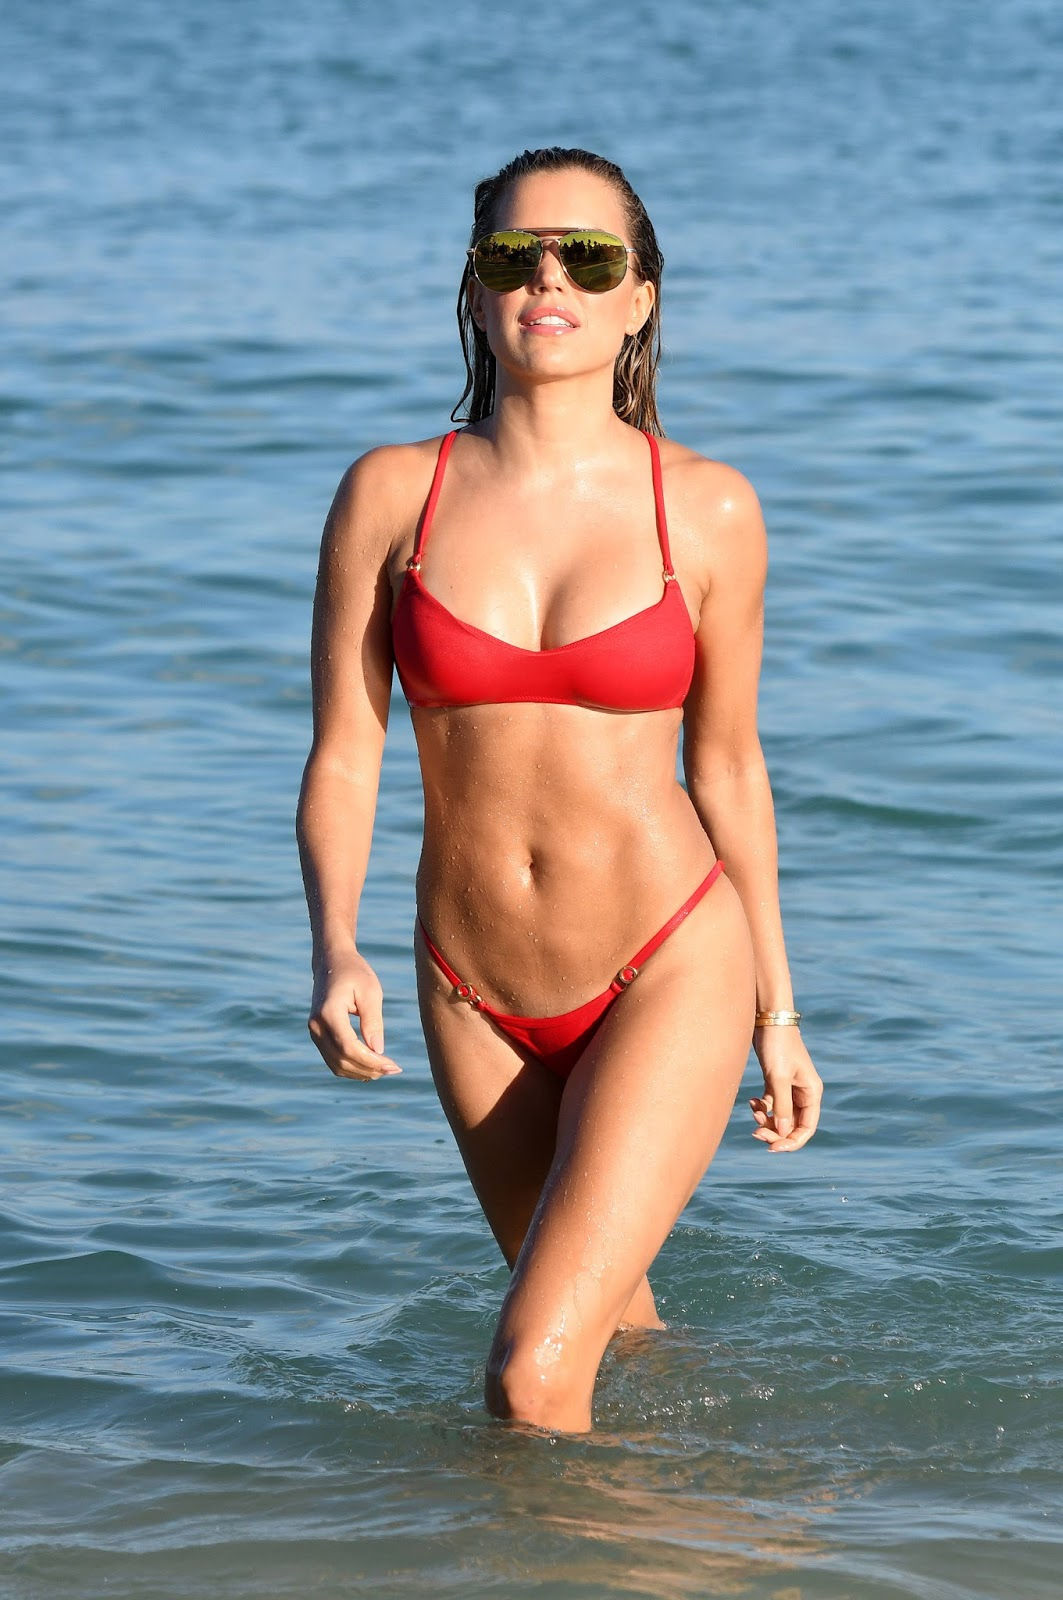 Sylvie Meis Hot in Red Bikini